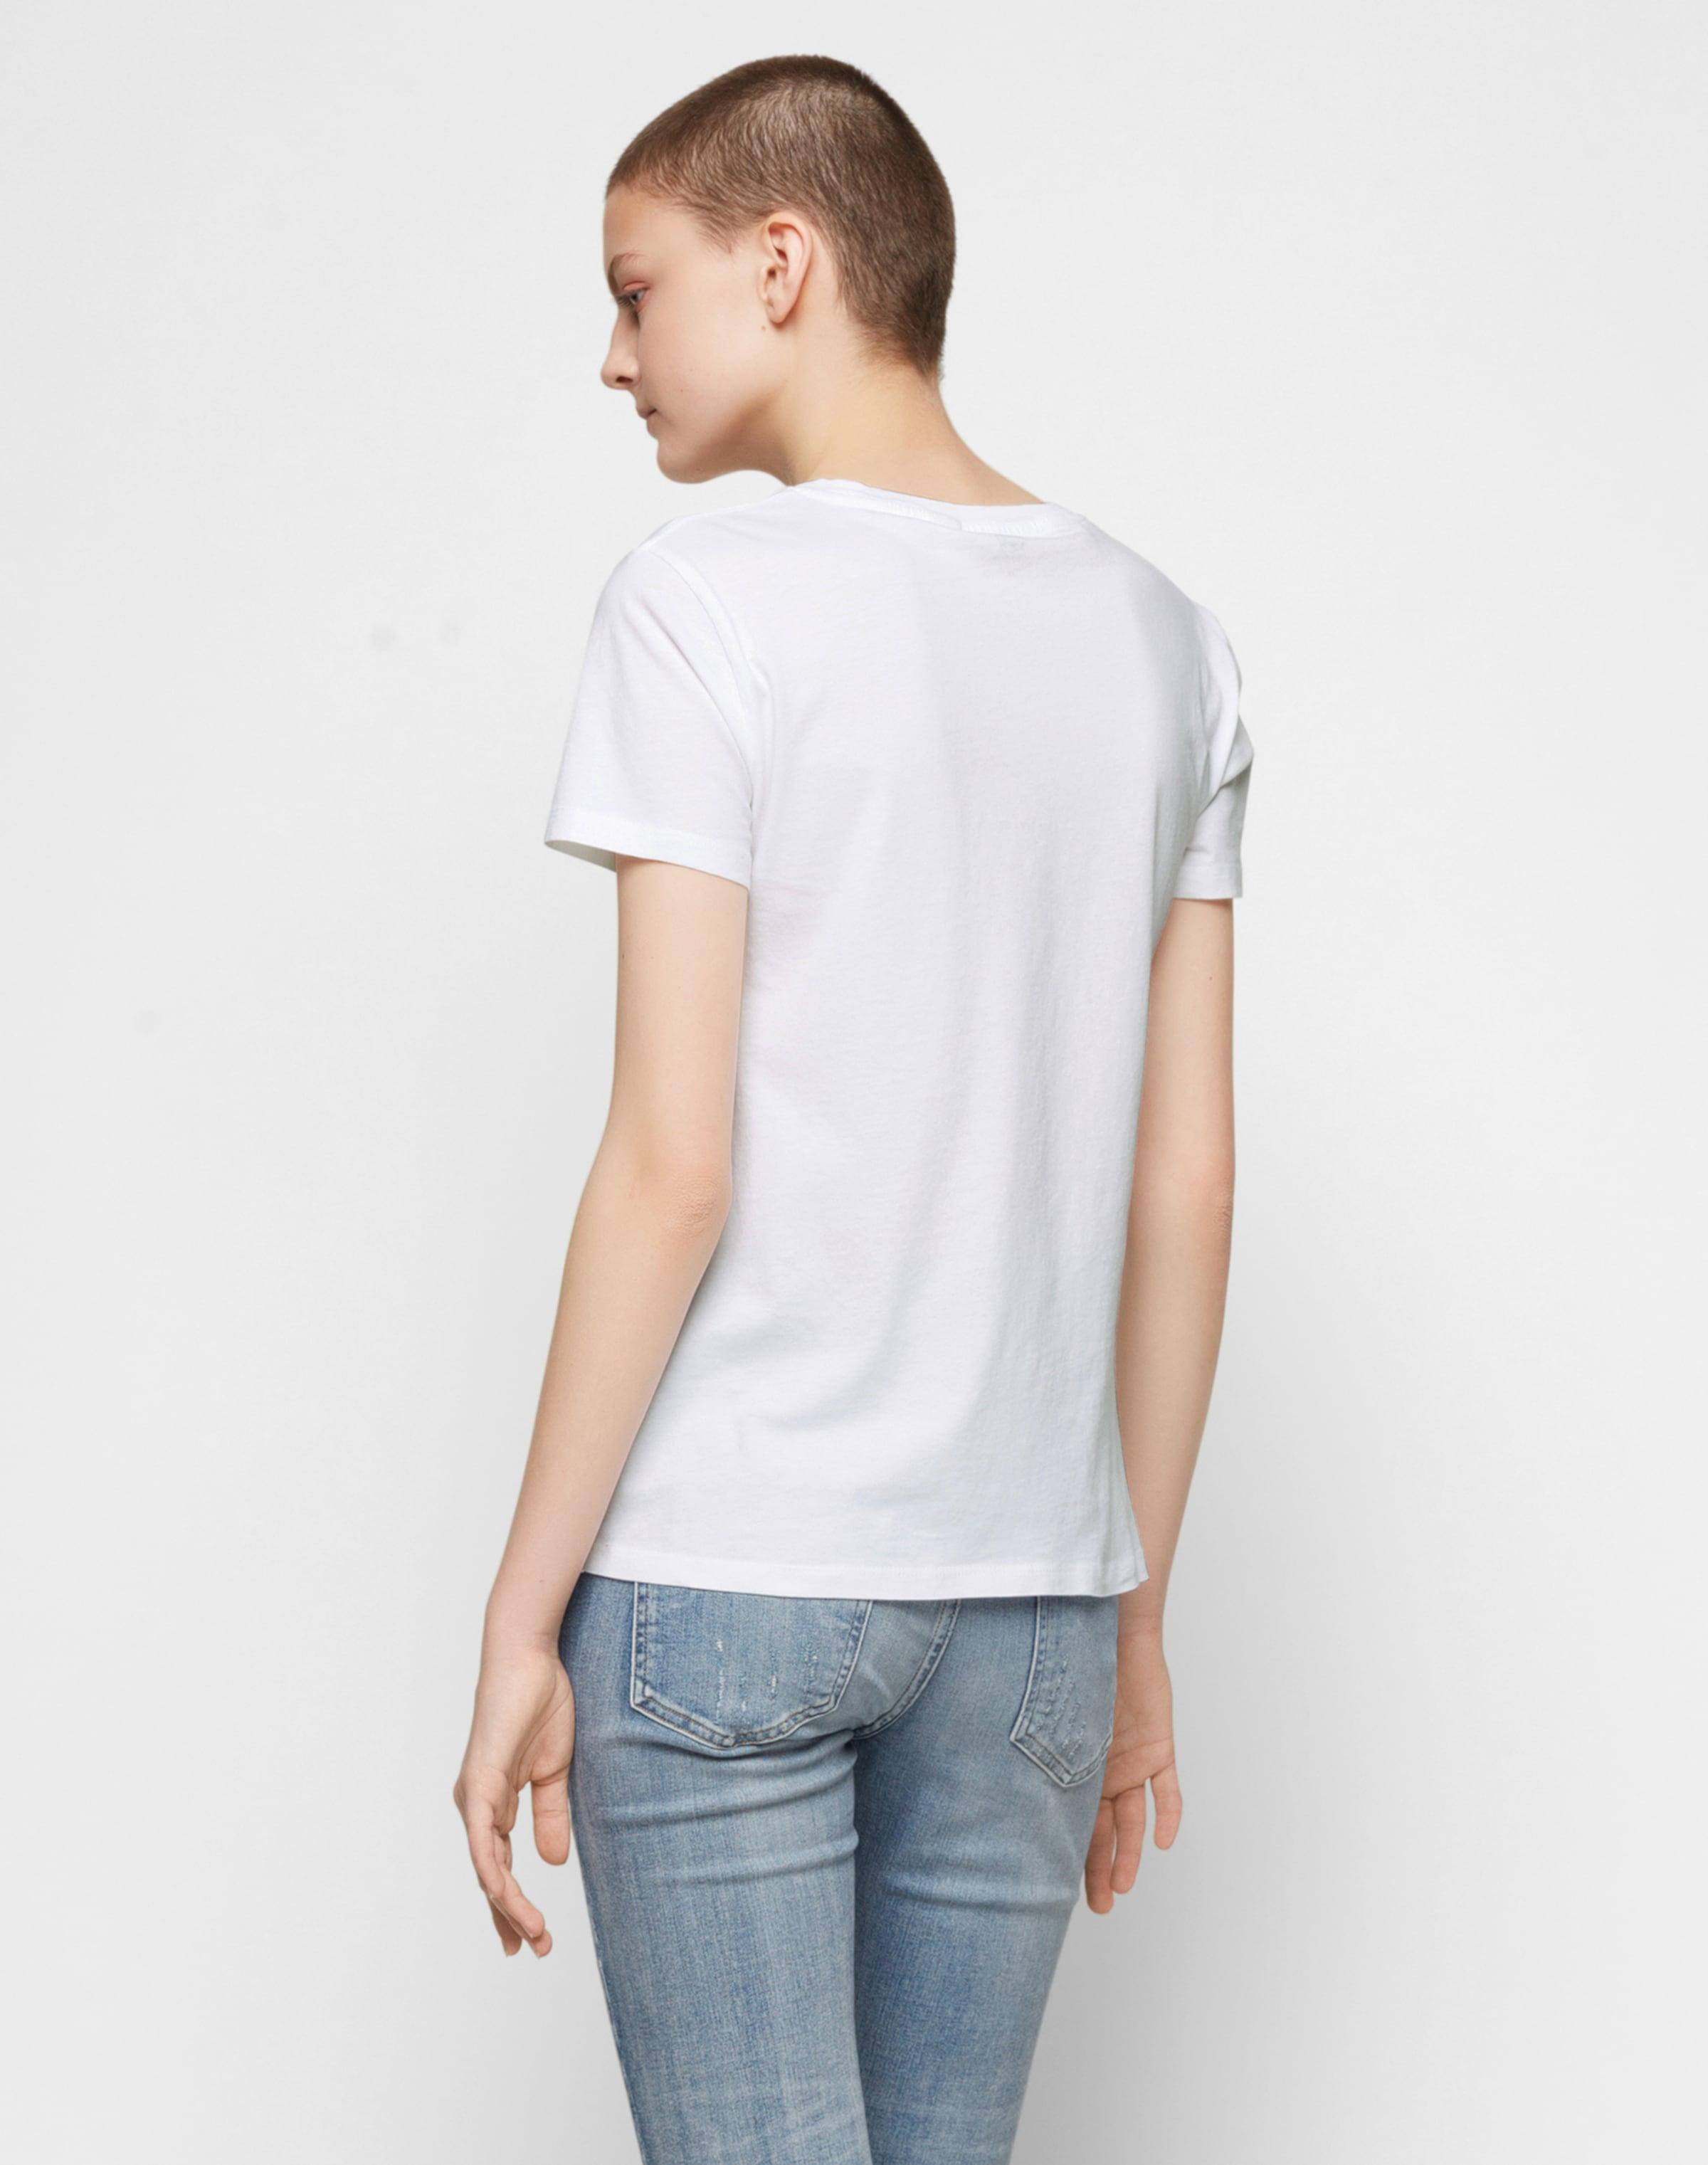 Blanc shirt BleuRouge Noir Levi's T En TlOZwkXiuP